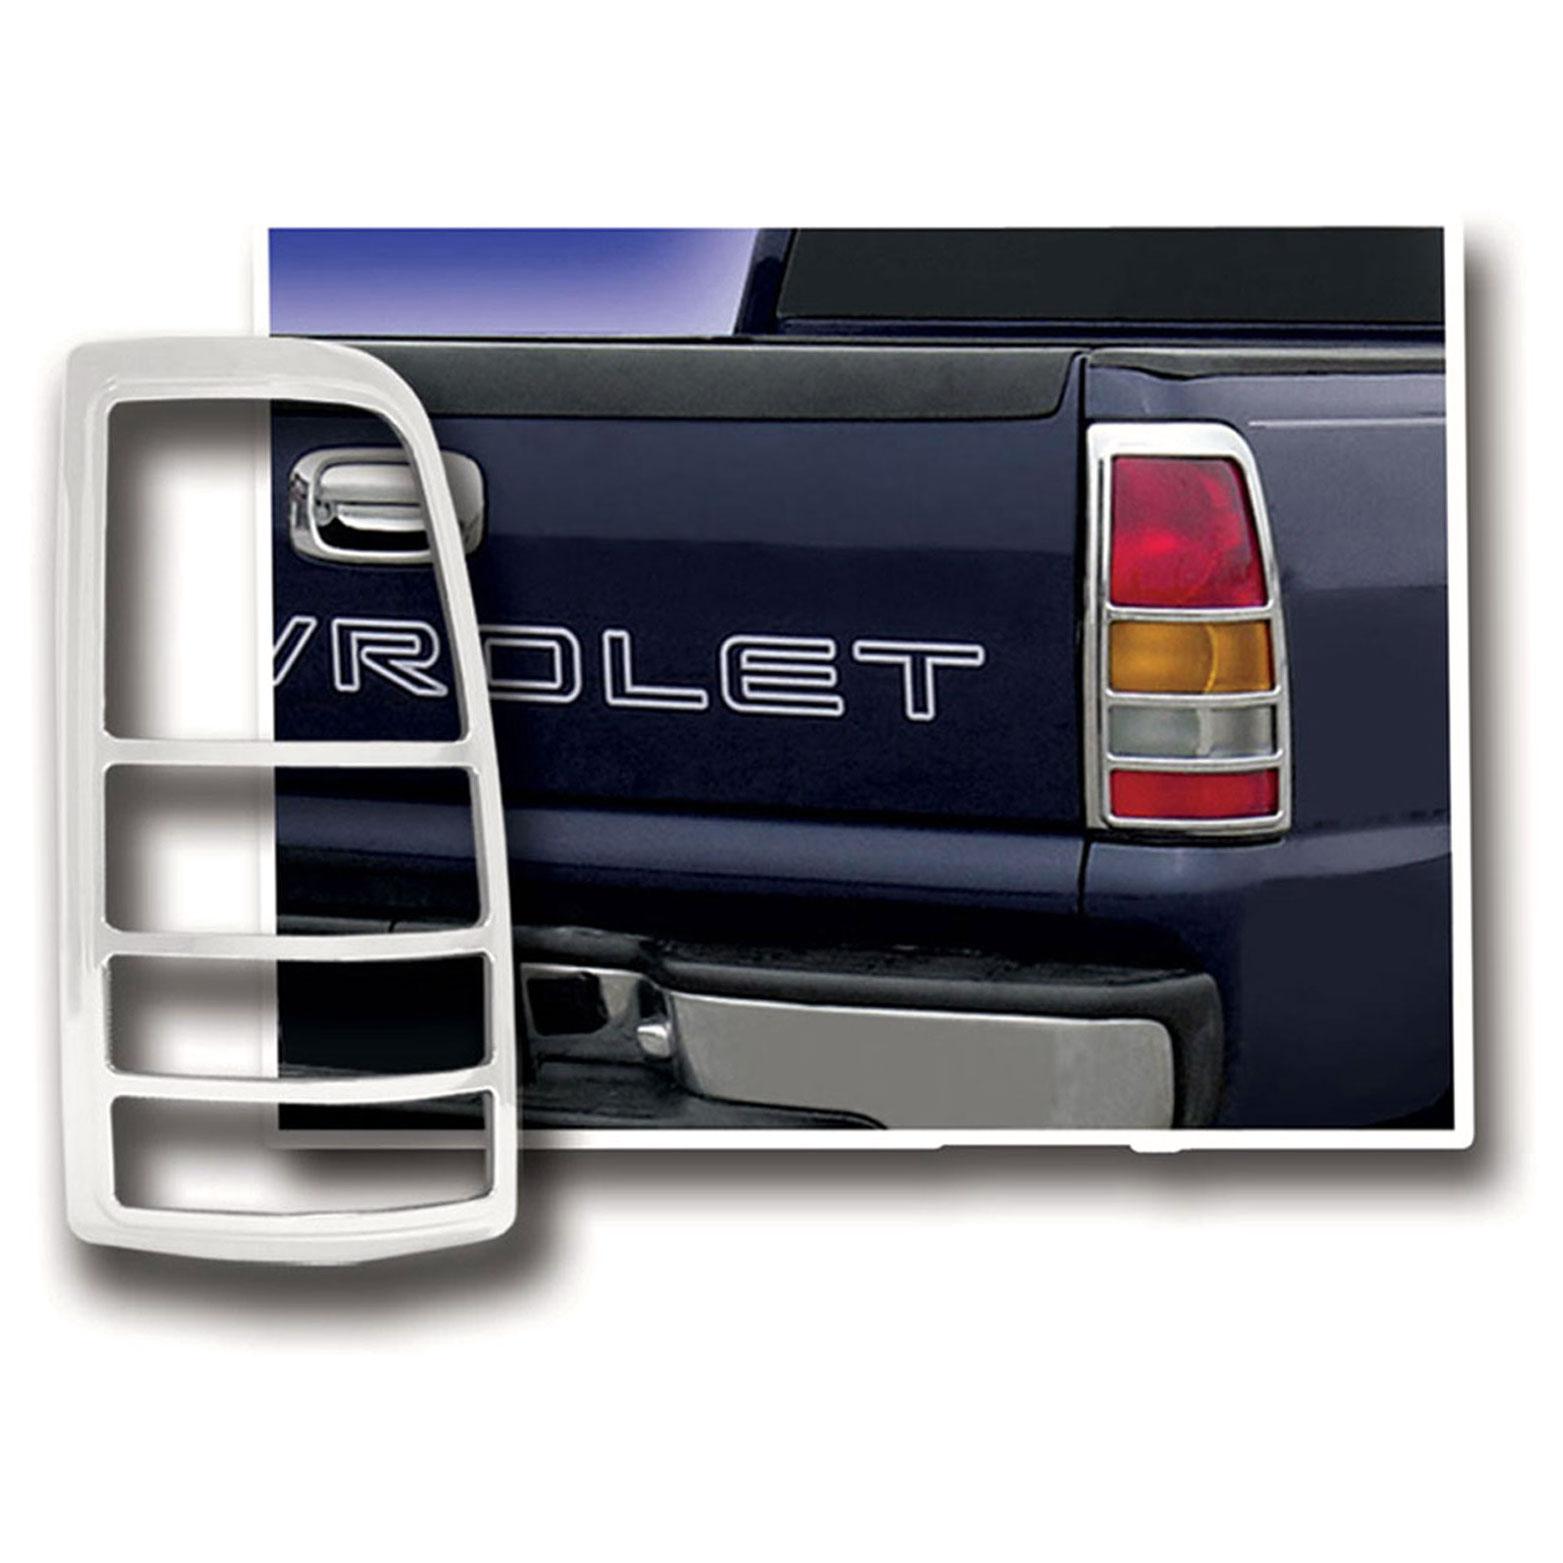 Upgrade Your Auto Premium FX Chrome Tail Light Bezels for 1999-2006 GMC Sierra Fleetside